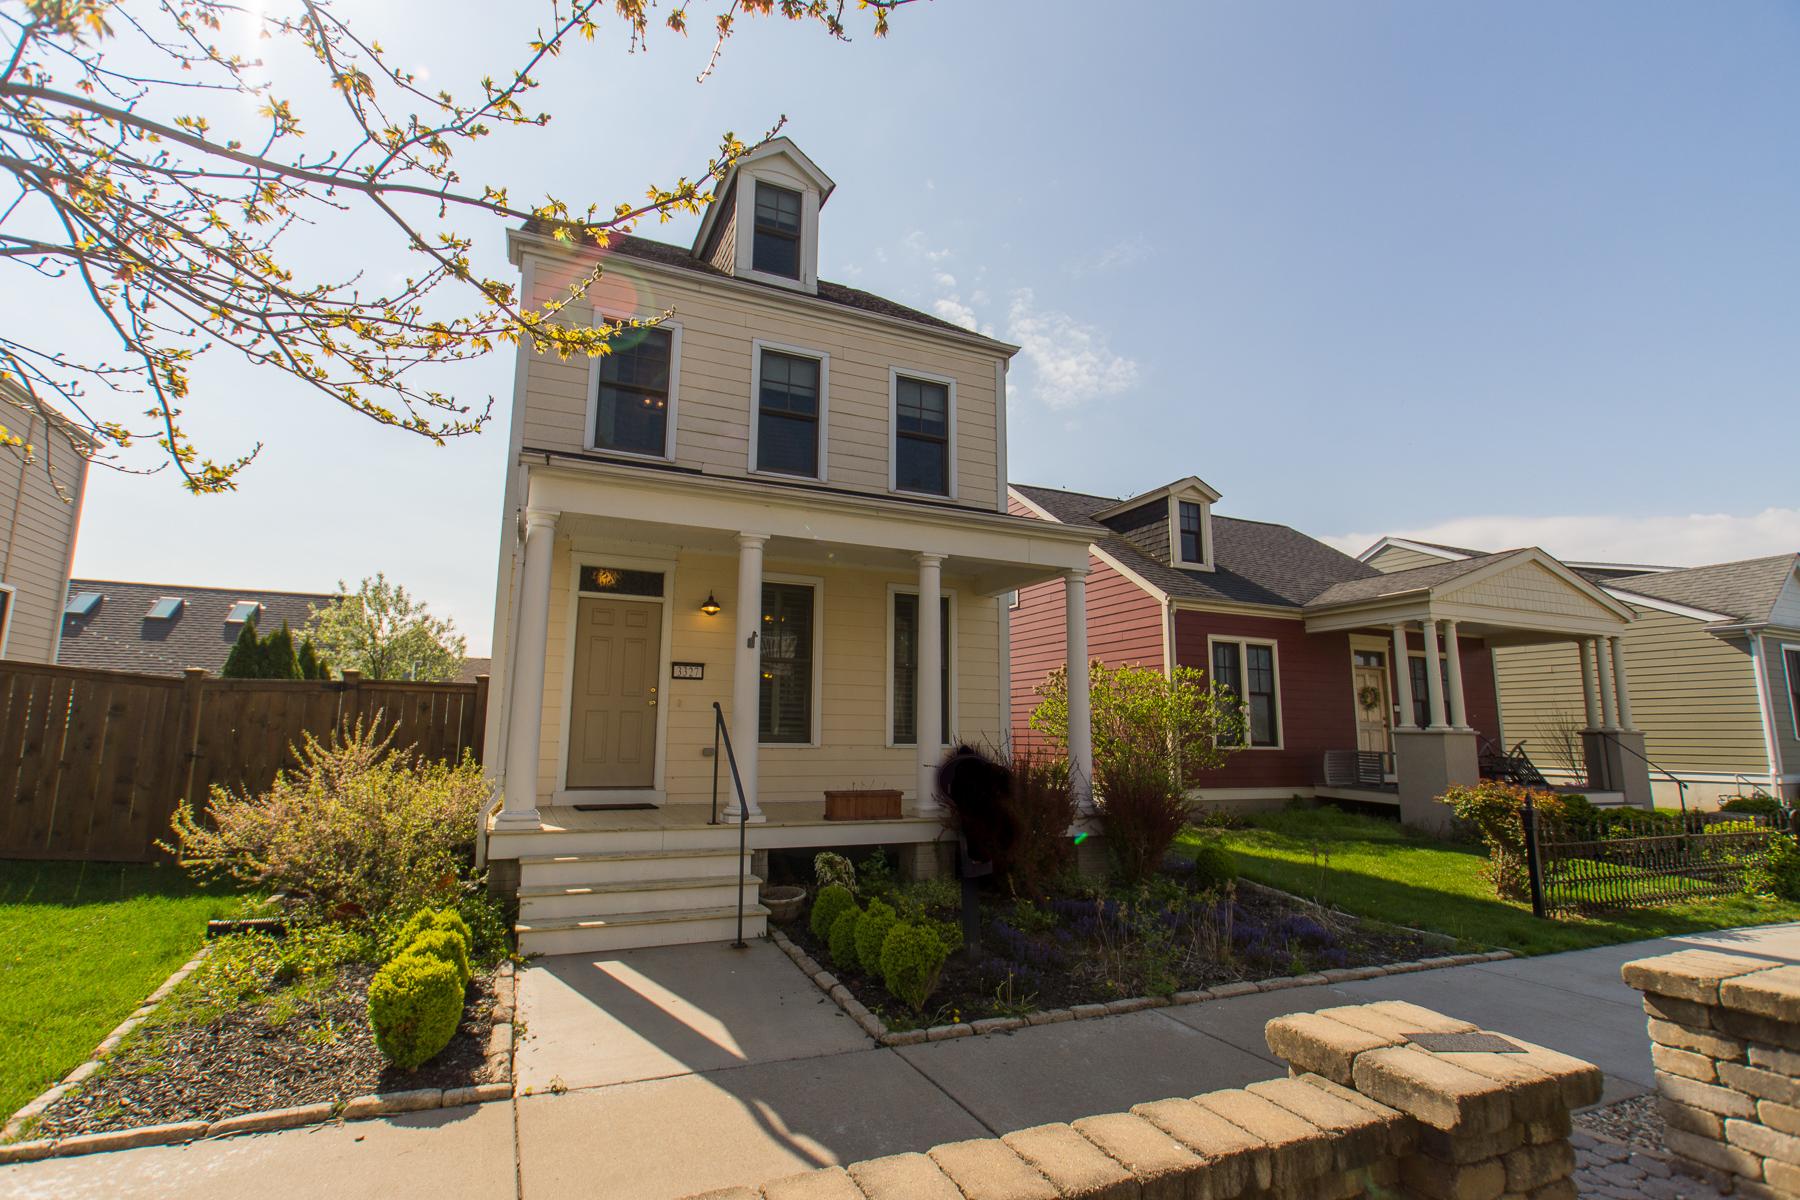 独户住宅 为 销售 在 North Canal Way 3327 North Canal Way 圣查尔斯, 密苏里州, 63301 美国